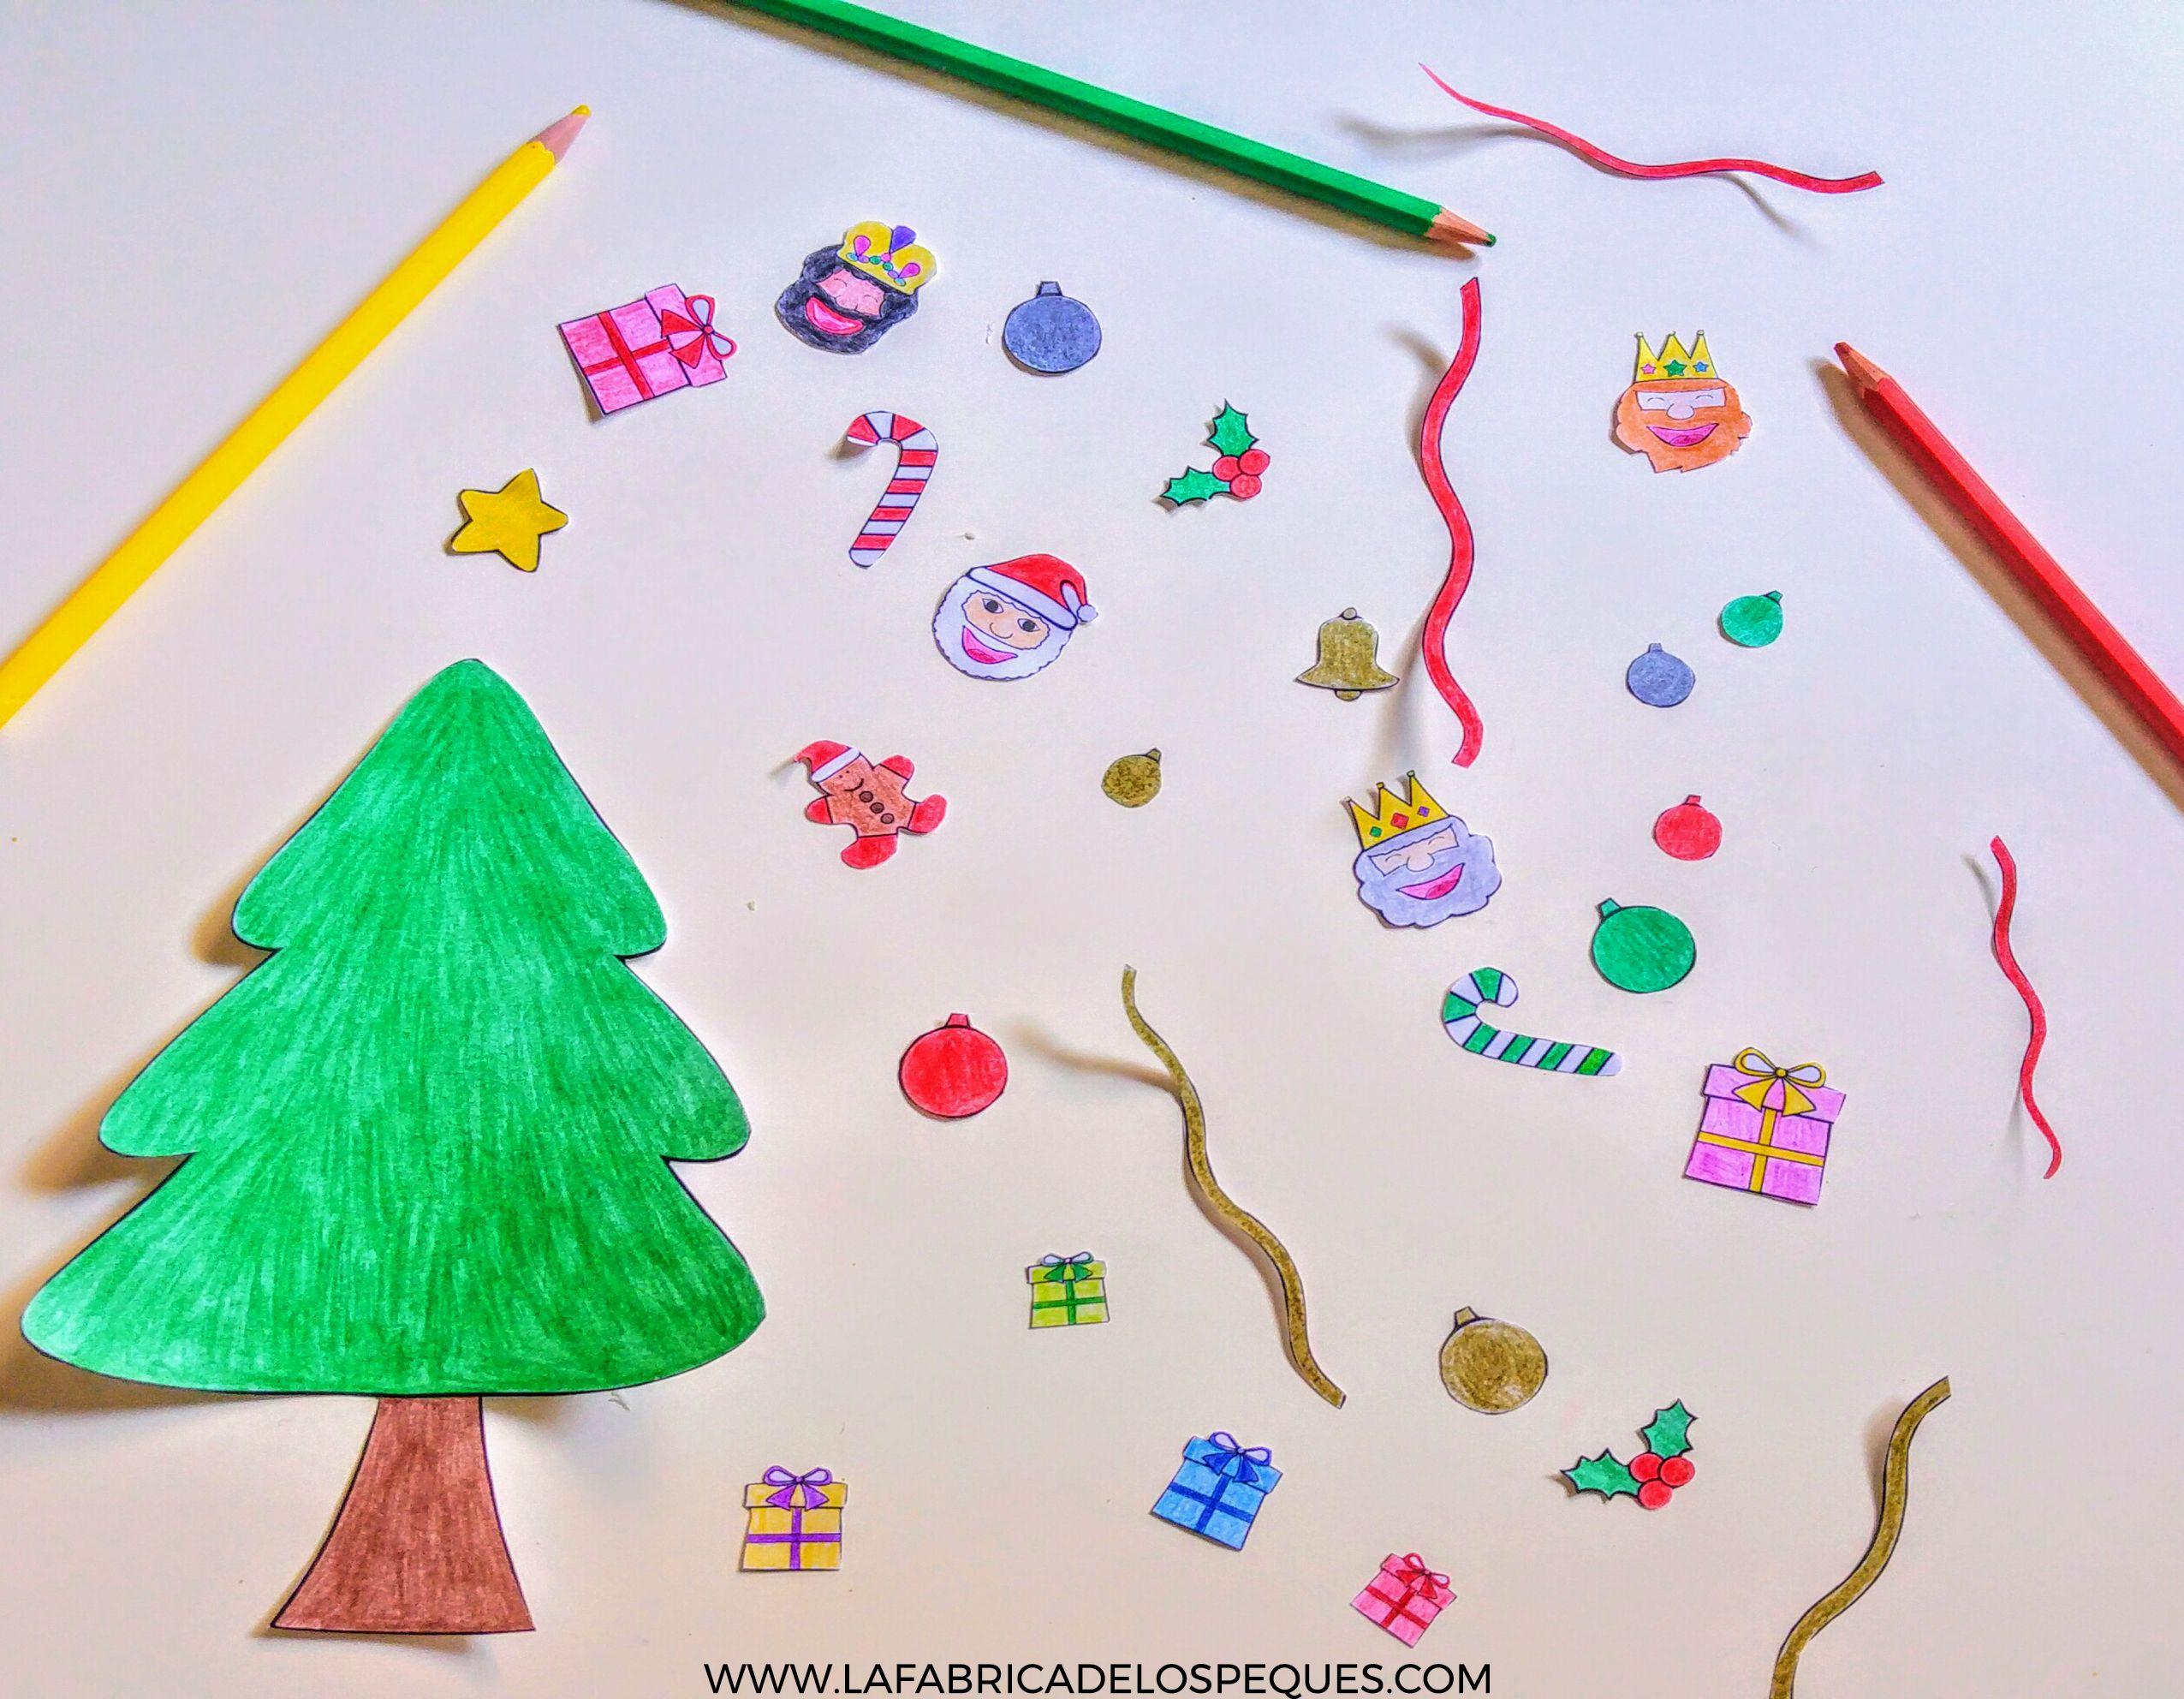 Imprimibles infantiles gratis árbol navidad papel | Navidad ...